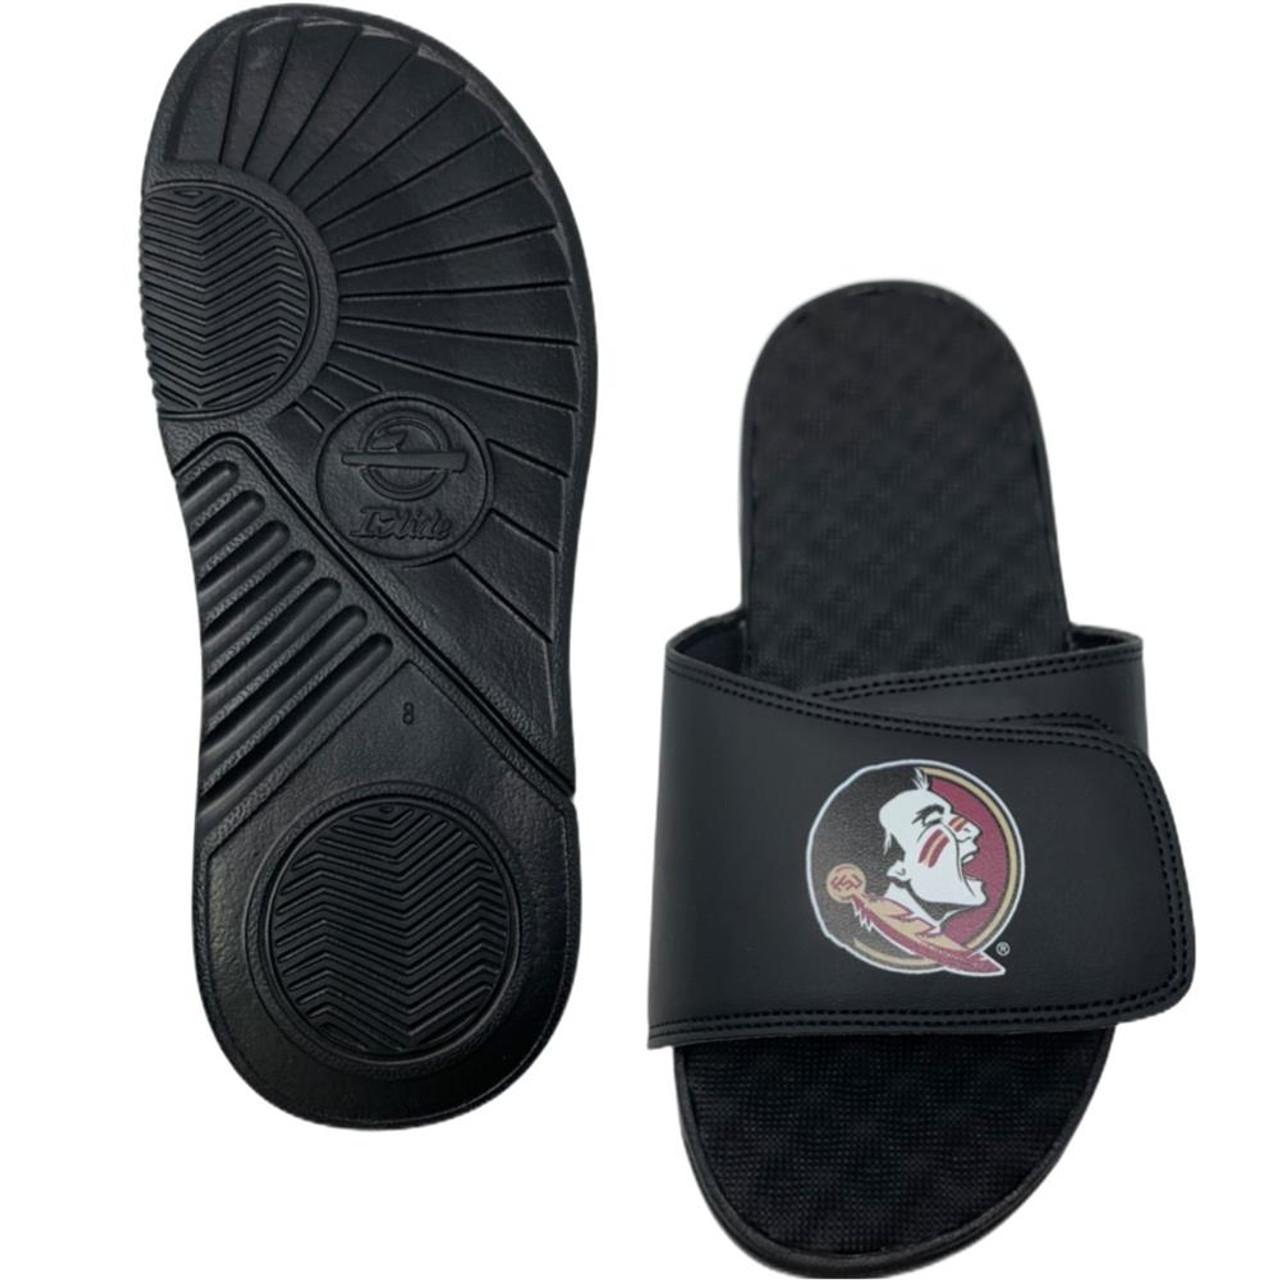 Purdue University Slides ISlide Primary Adjustable Sandals